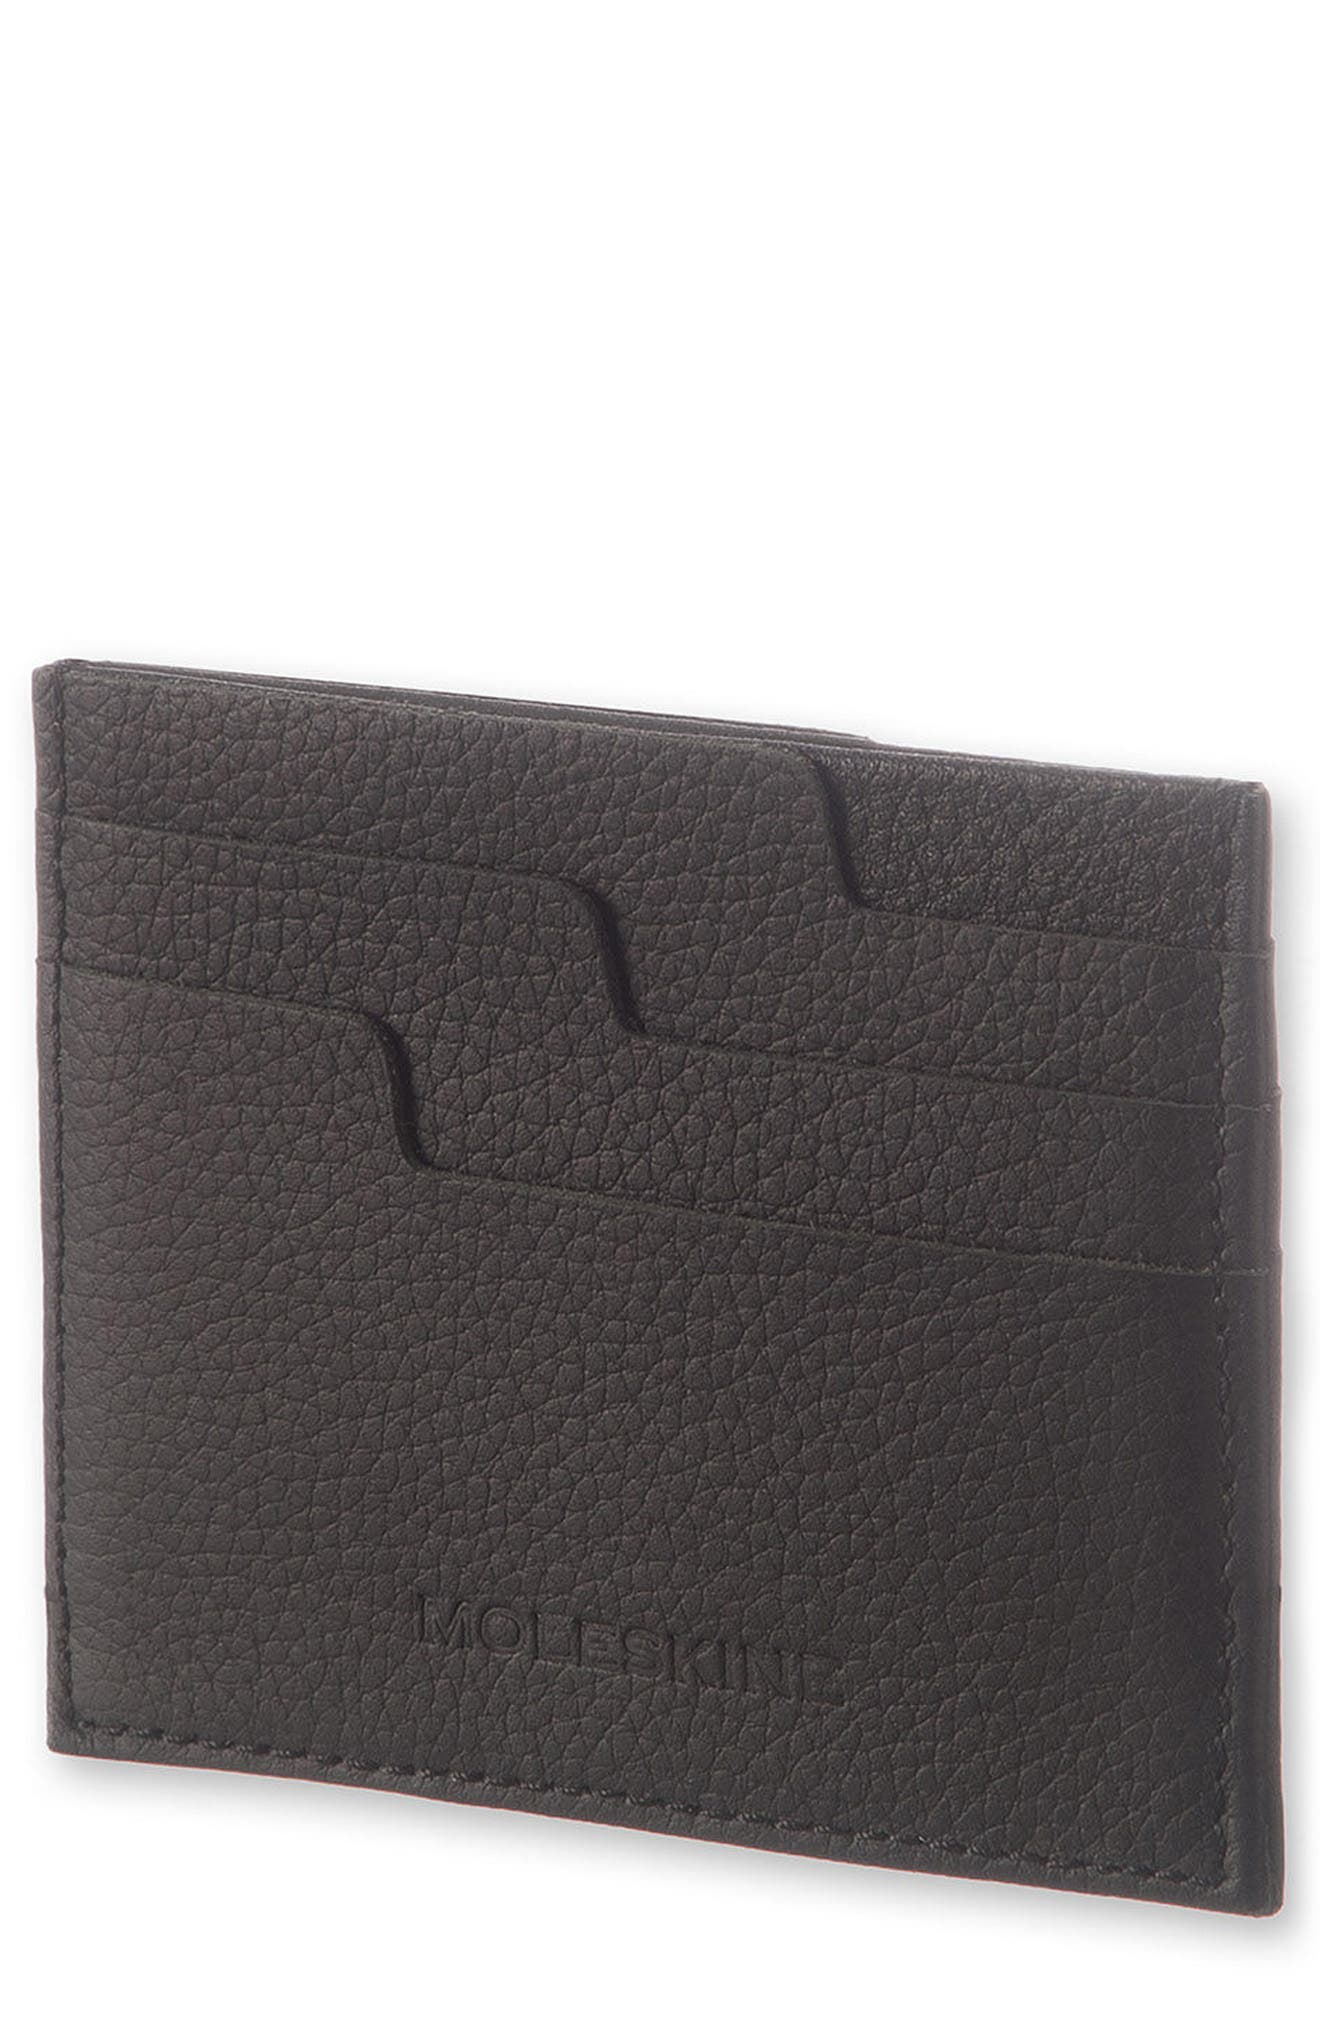 Moleskin Lineage Leather Card Case